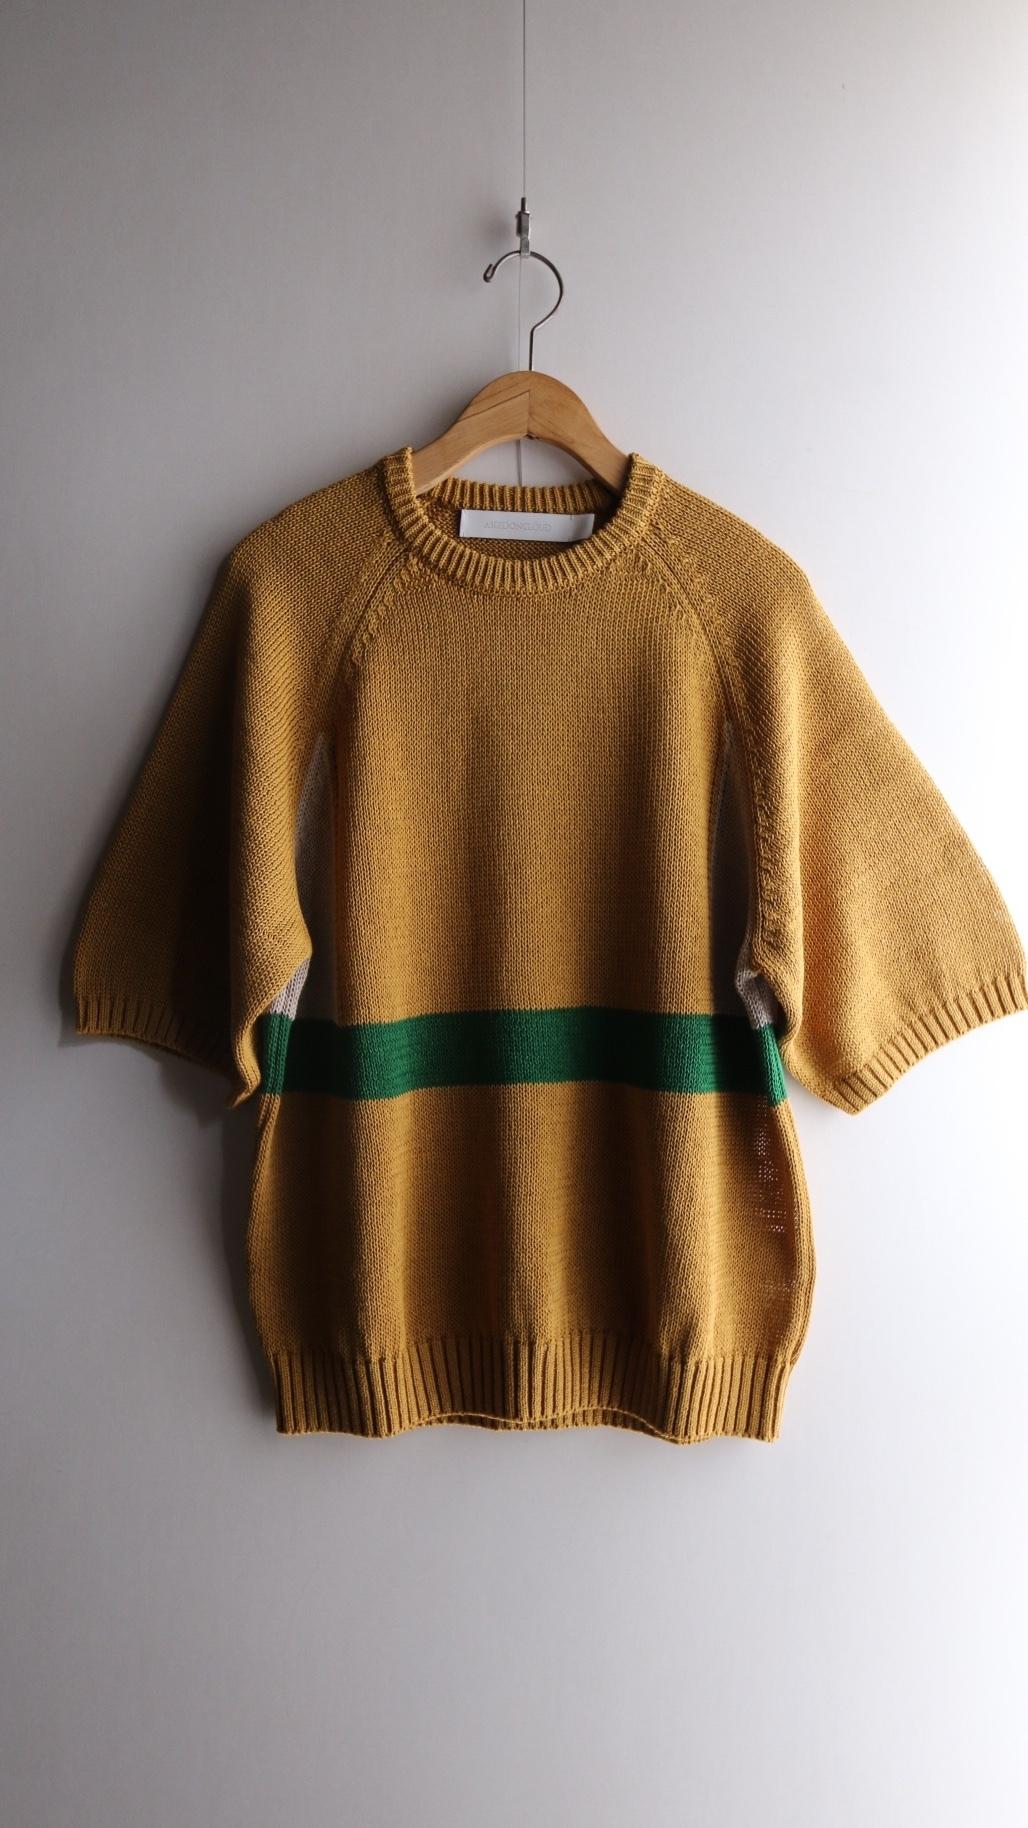 ASEEDONCLOUD/アシードンクラウド Knit T-shirt / ニットTシャツ #201803